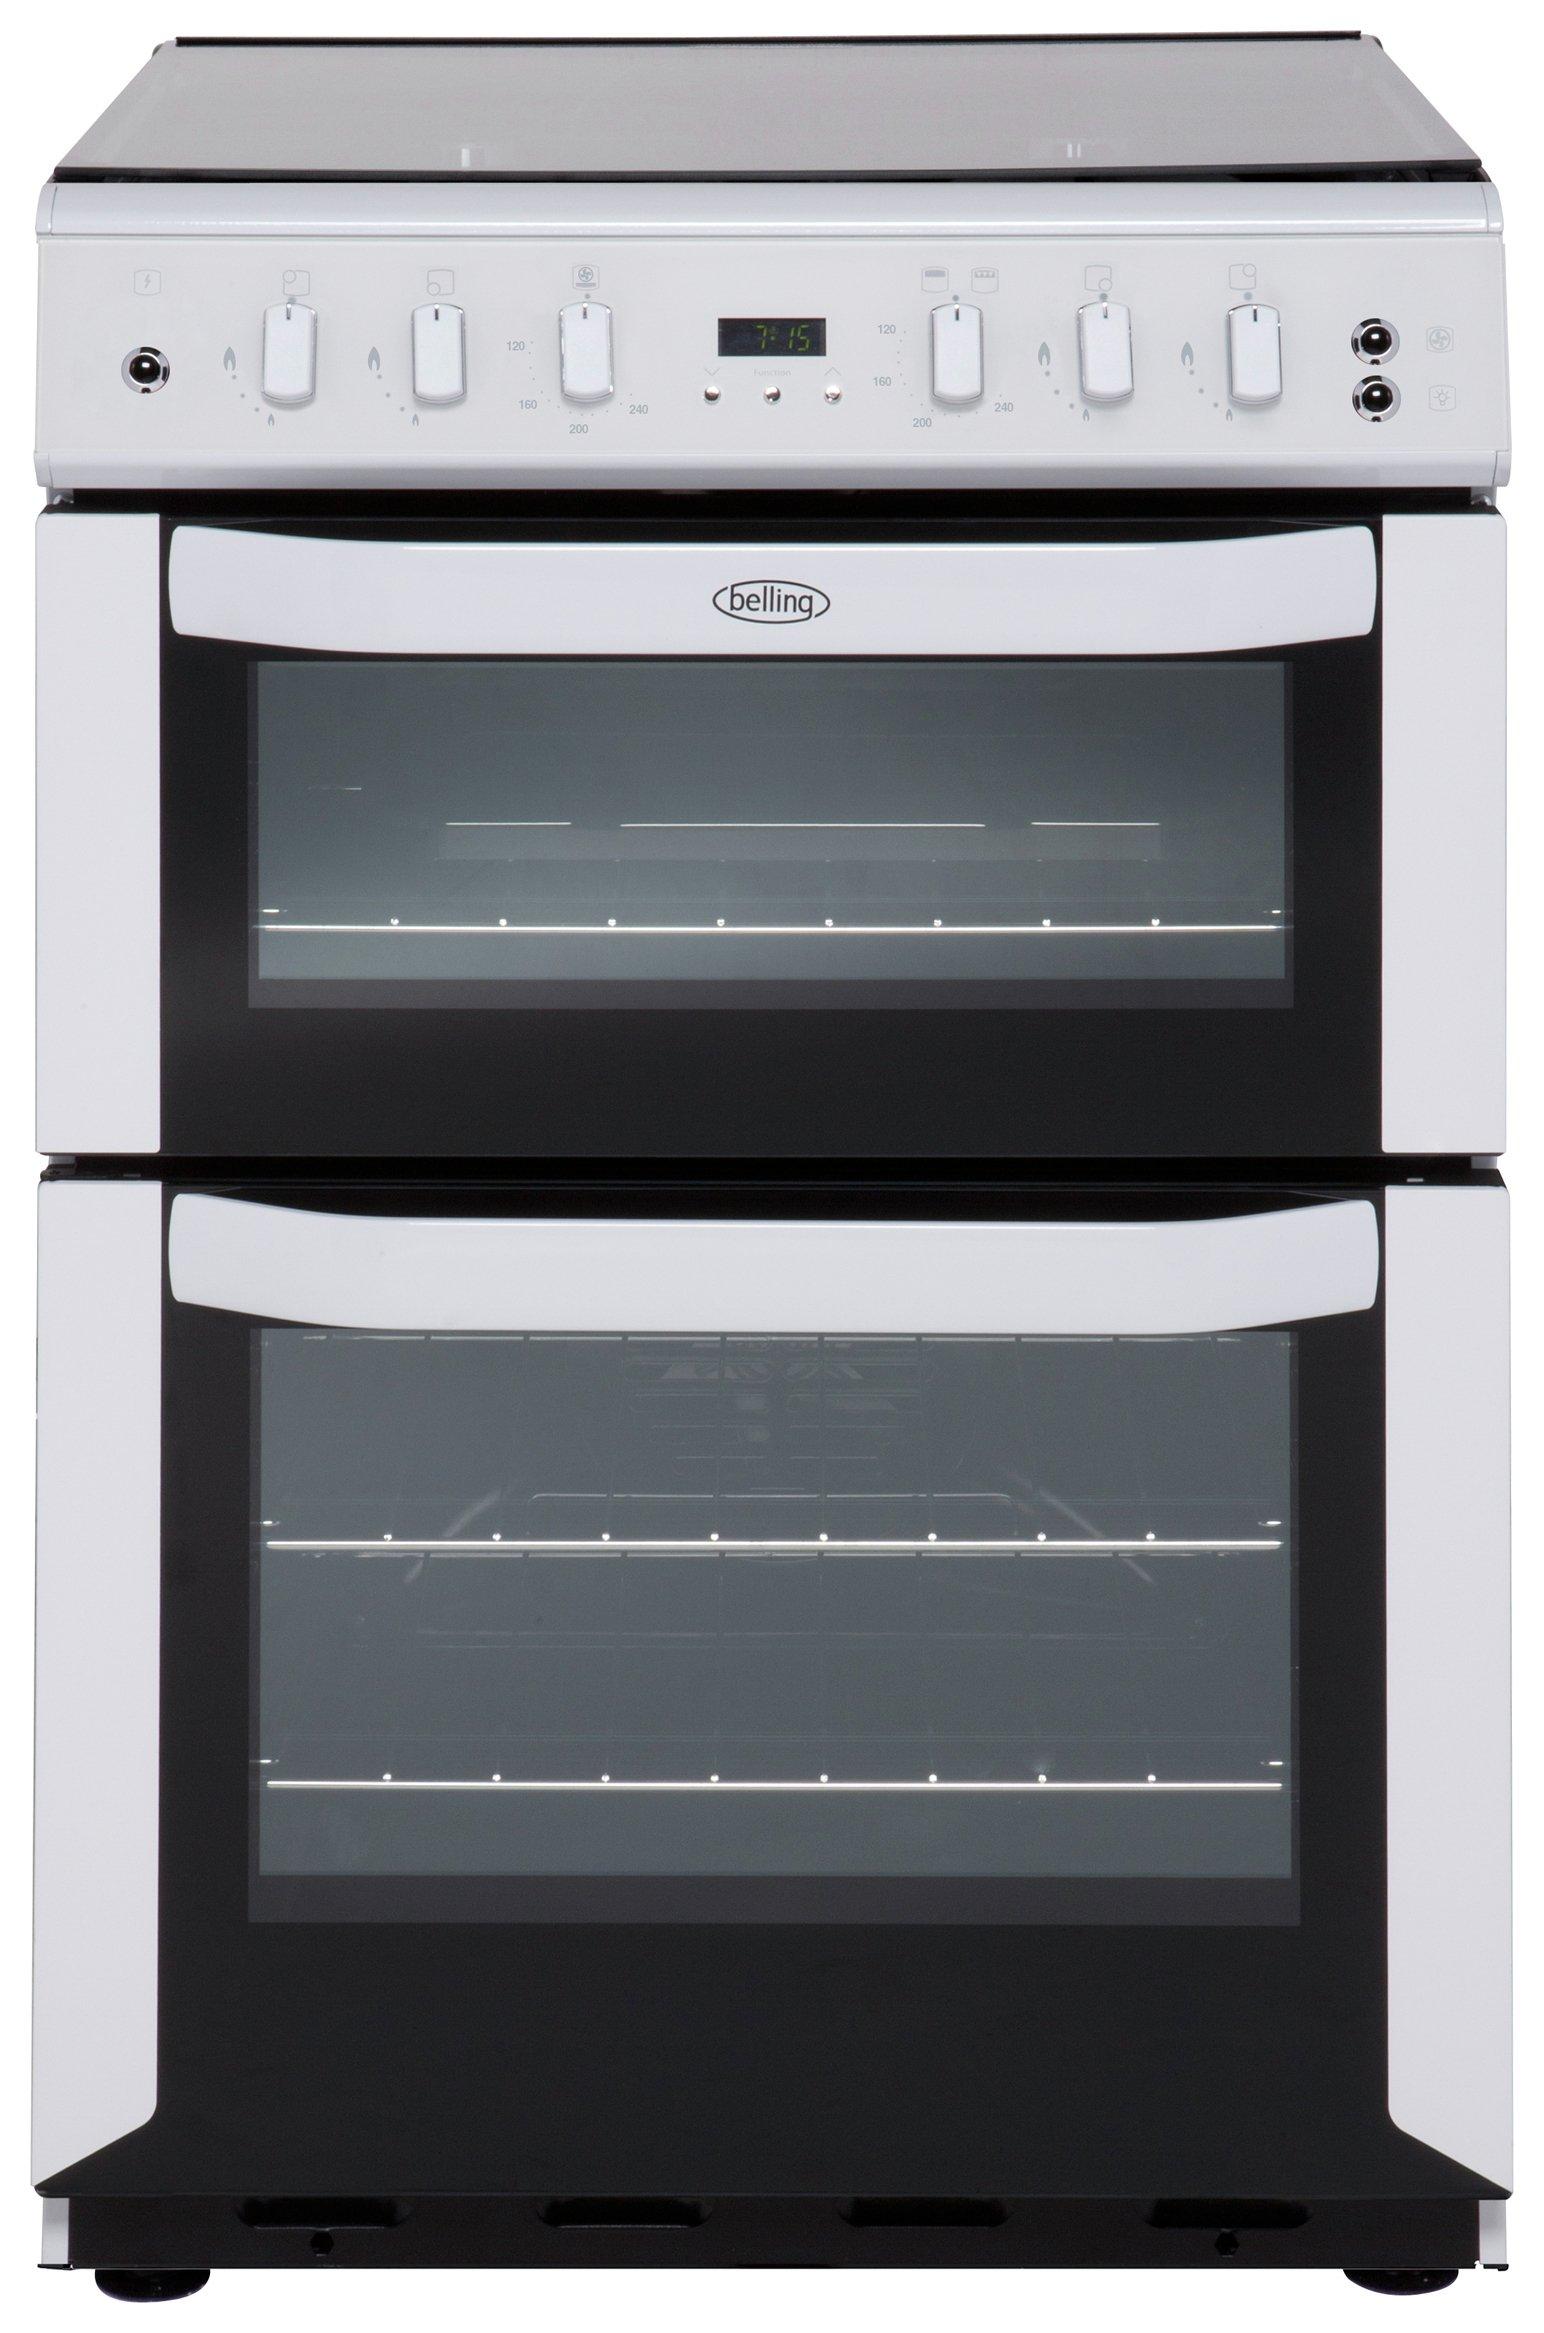 belling fsg60dof gas cooker white at argos. Black Bedroom Furniture Sets. Home Design Ideas